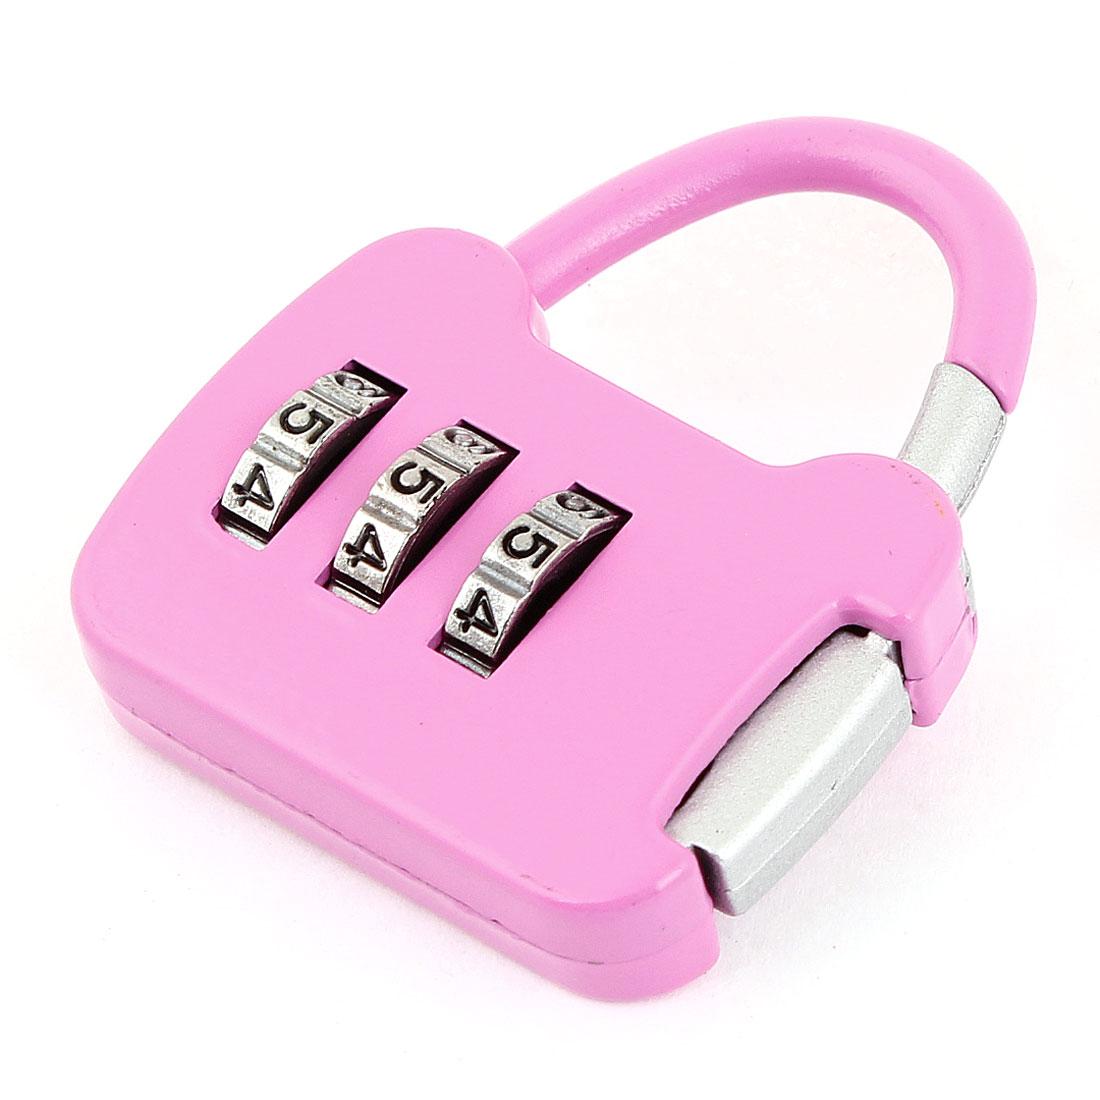 Metallic 3 Digits Magenta Jewelry Box Combination Password Padlock